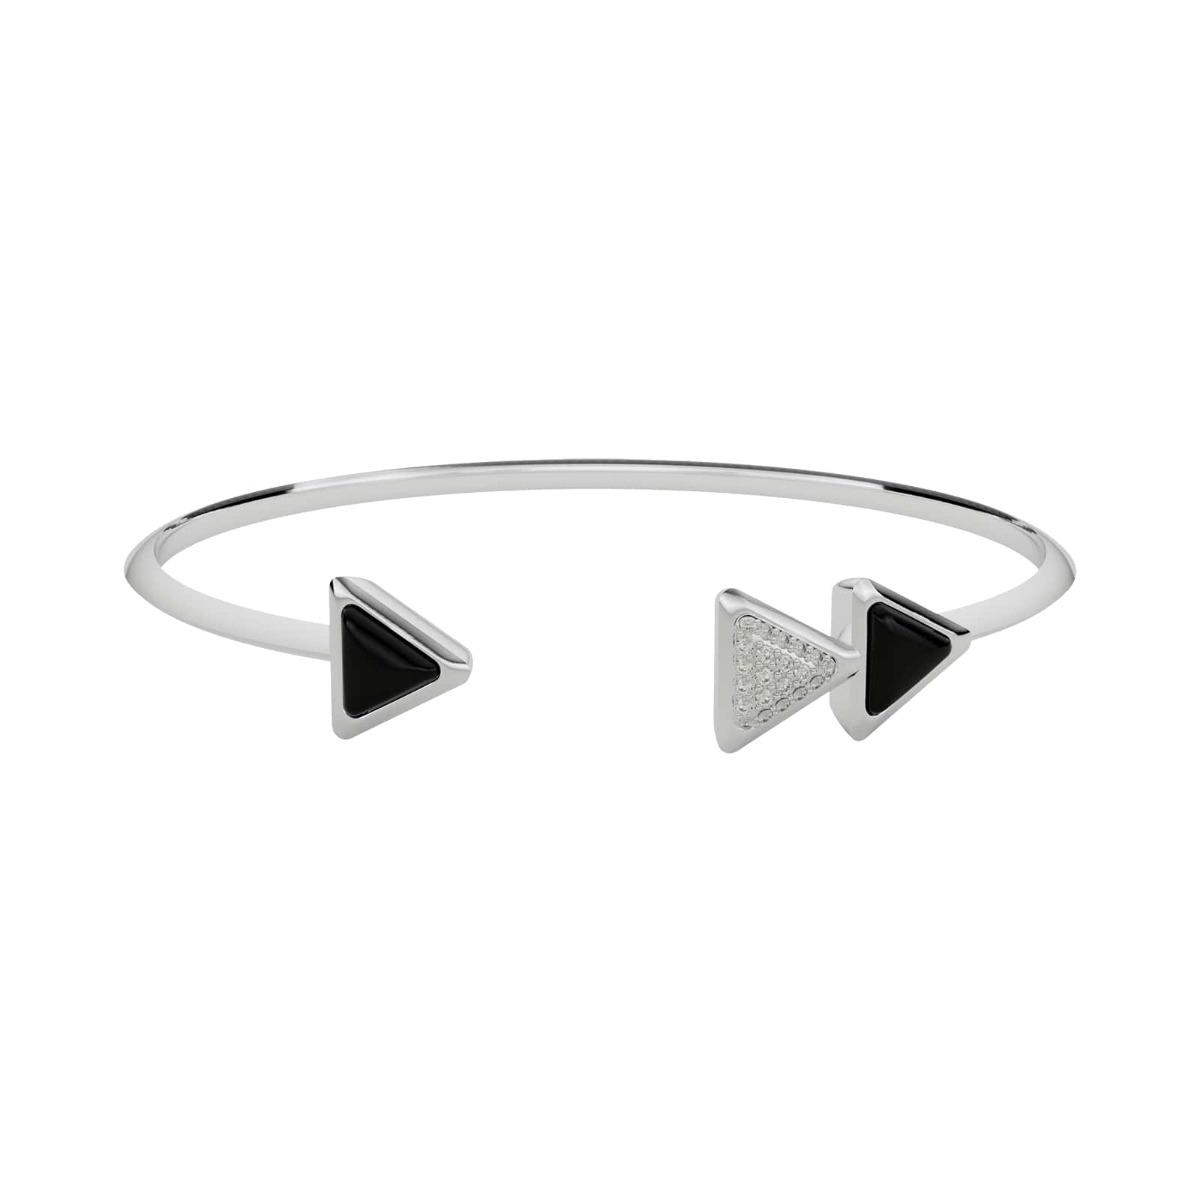 Bracelet Dove Vai Forward Exquisite White Gold Onix and Diamonds